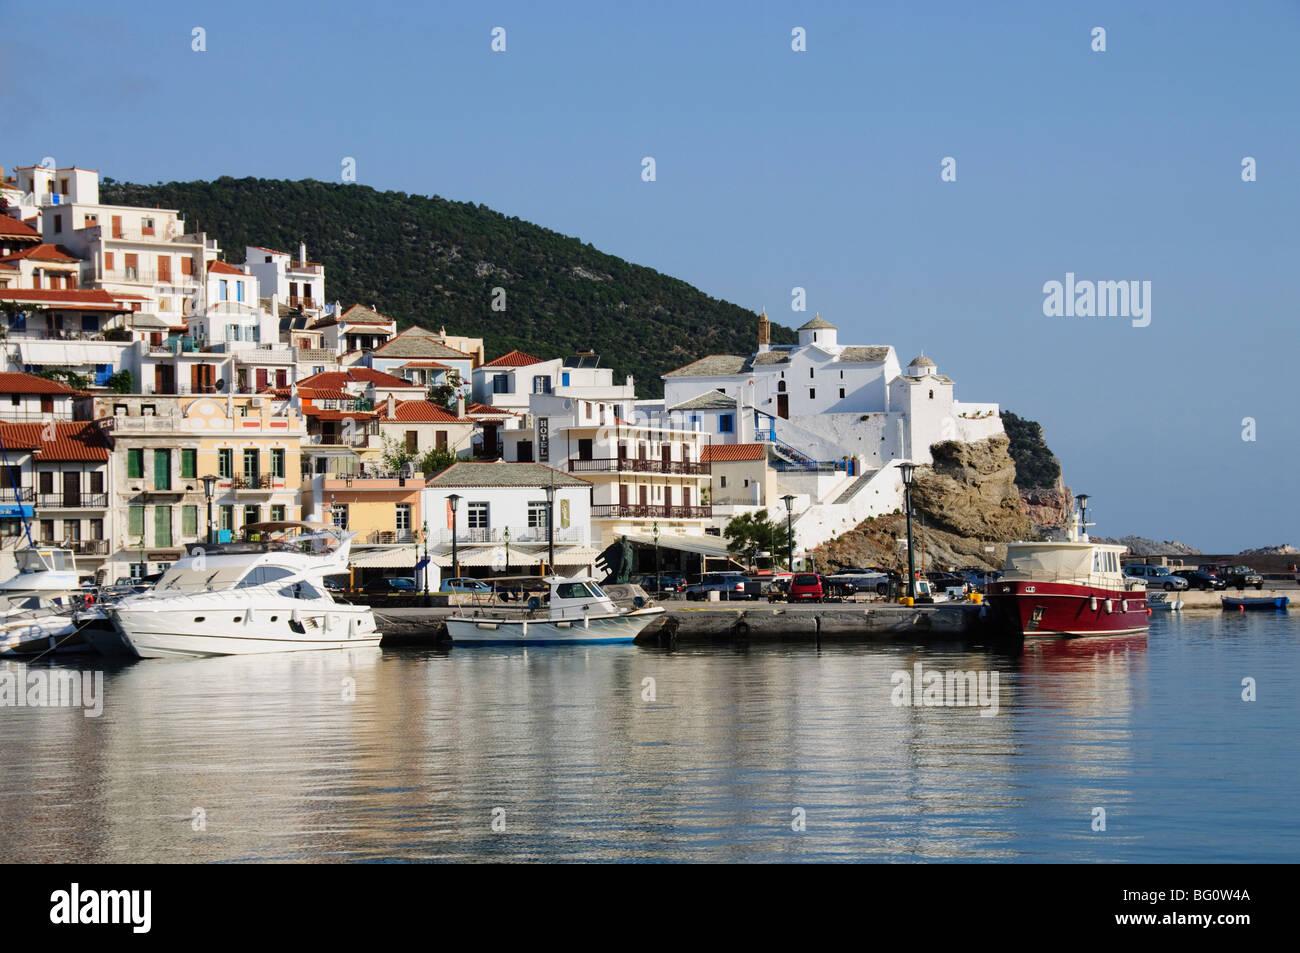 La ville de Skopelos, Sporades Skopelos, Îles, Îles grecques, Grèce, Europe Photo Stock